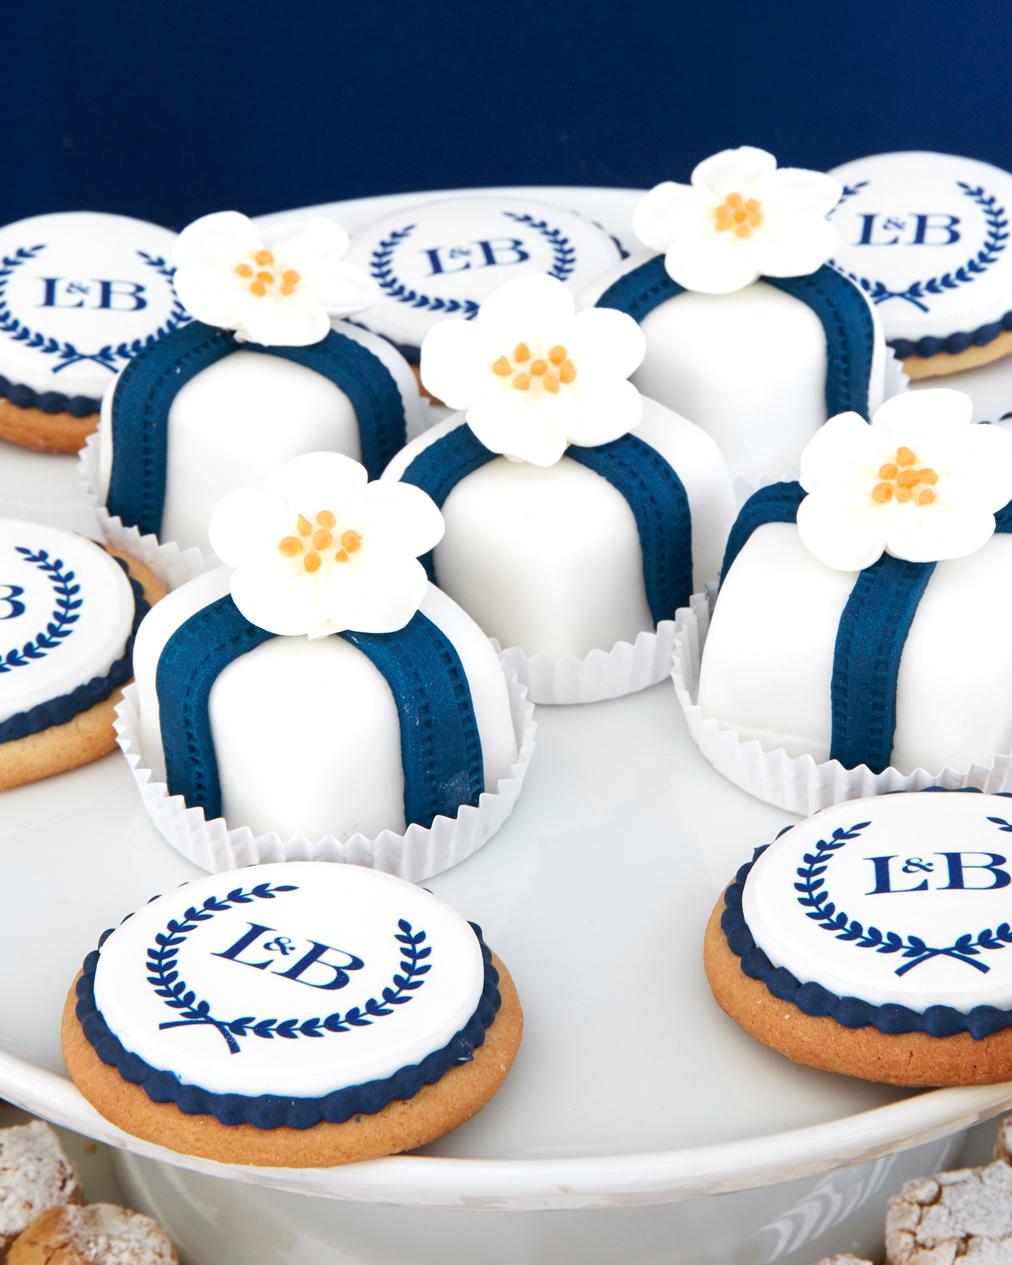 lydia-barritt-wedding-desserts-0414.jpg